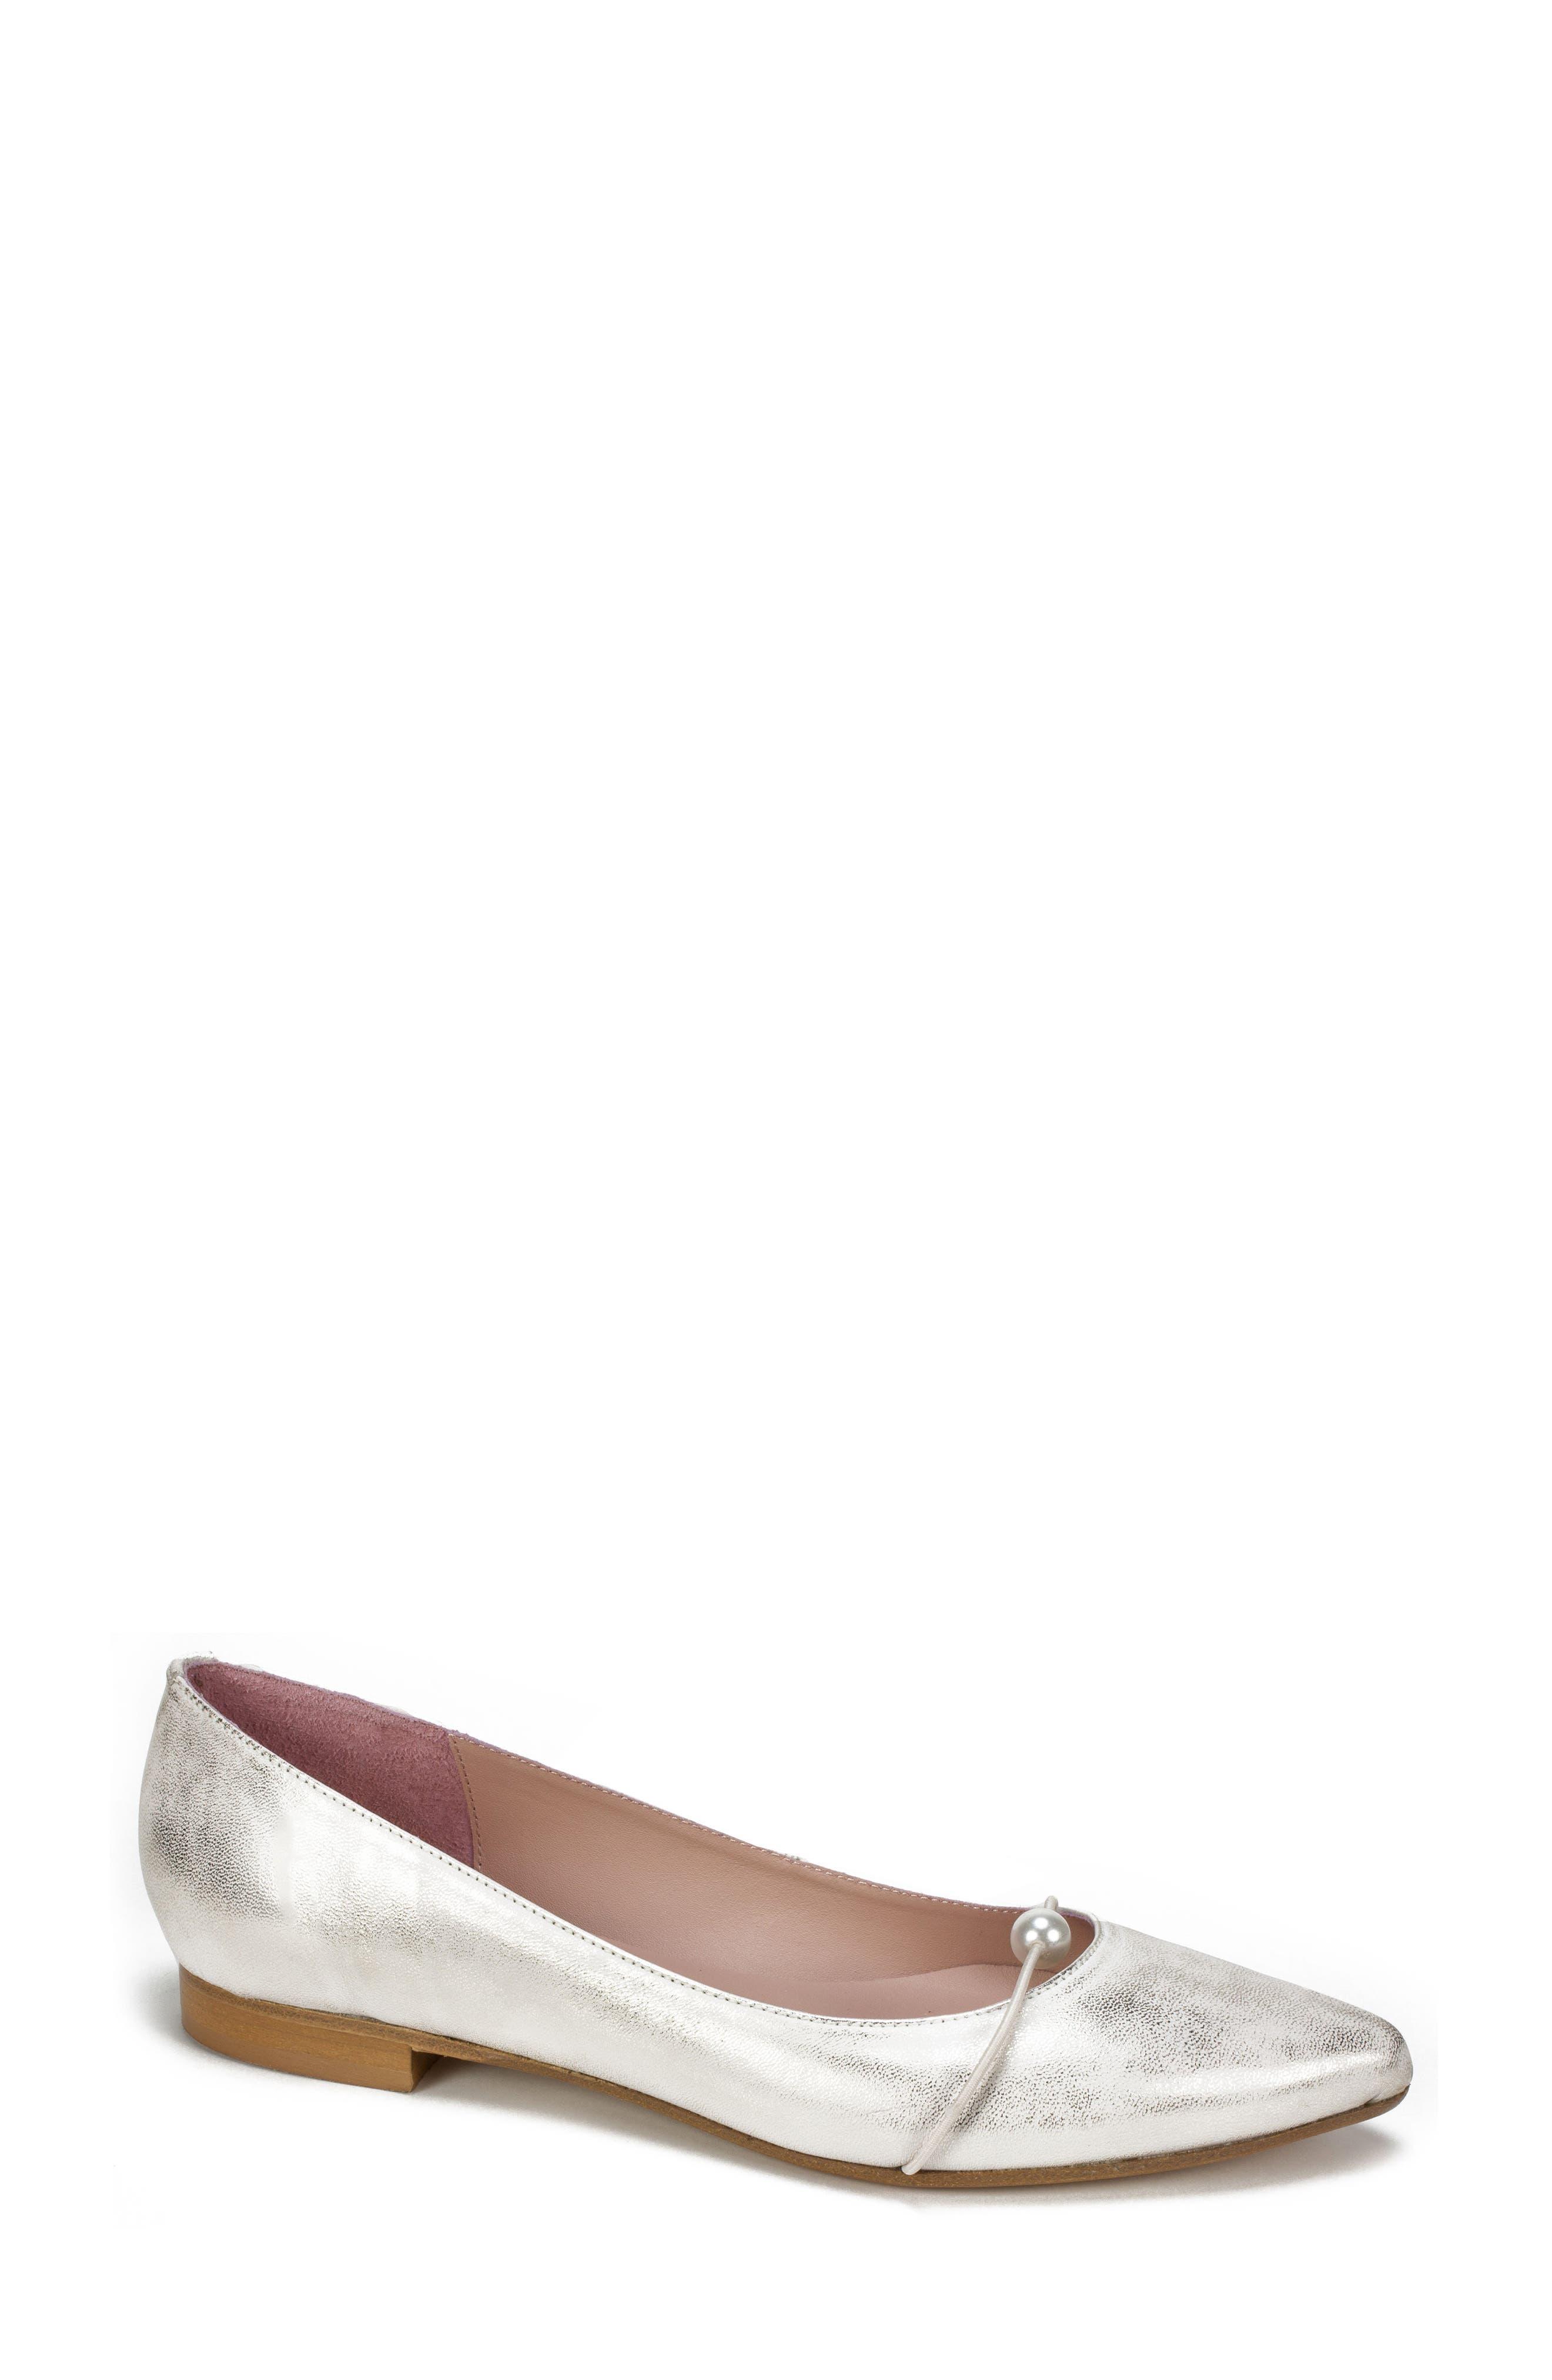 9839816e8cc Women s Summit Flat Heel Shoes